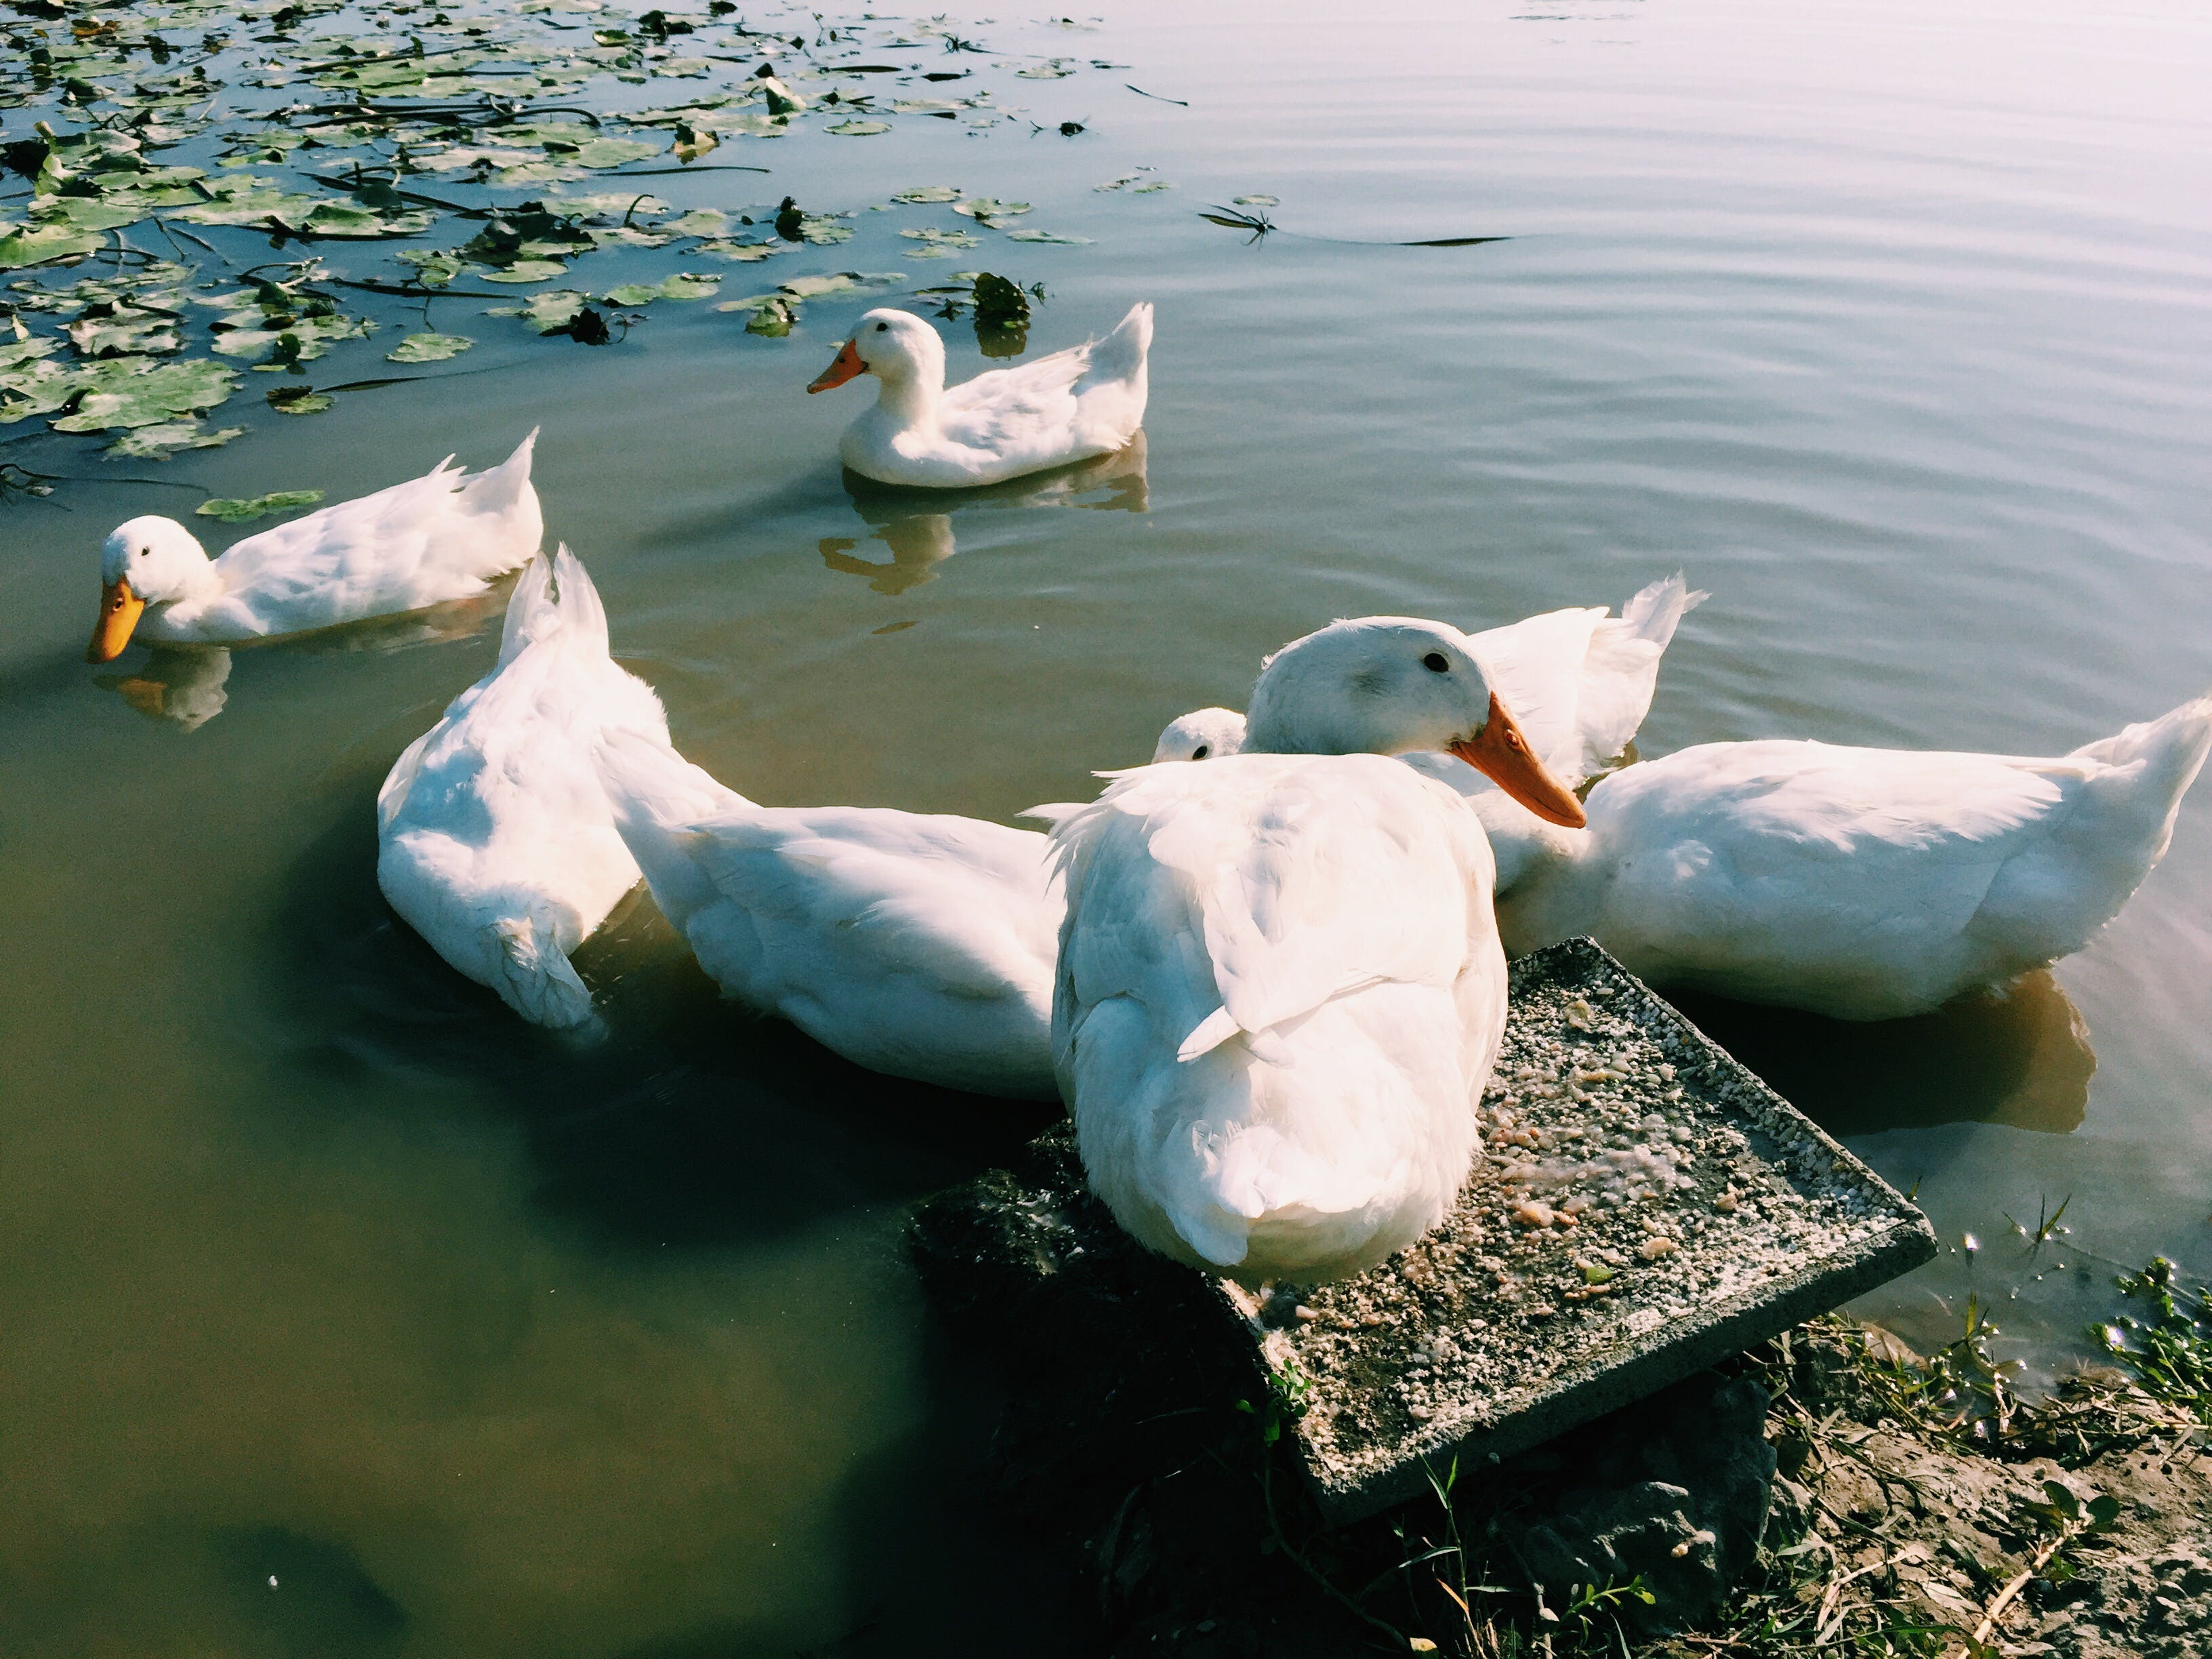 Free stock photo of #mobilechallenge, bath ducks, ducks, iphone 6 plus